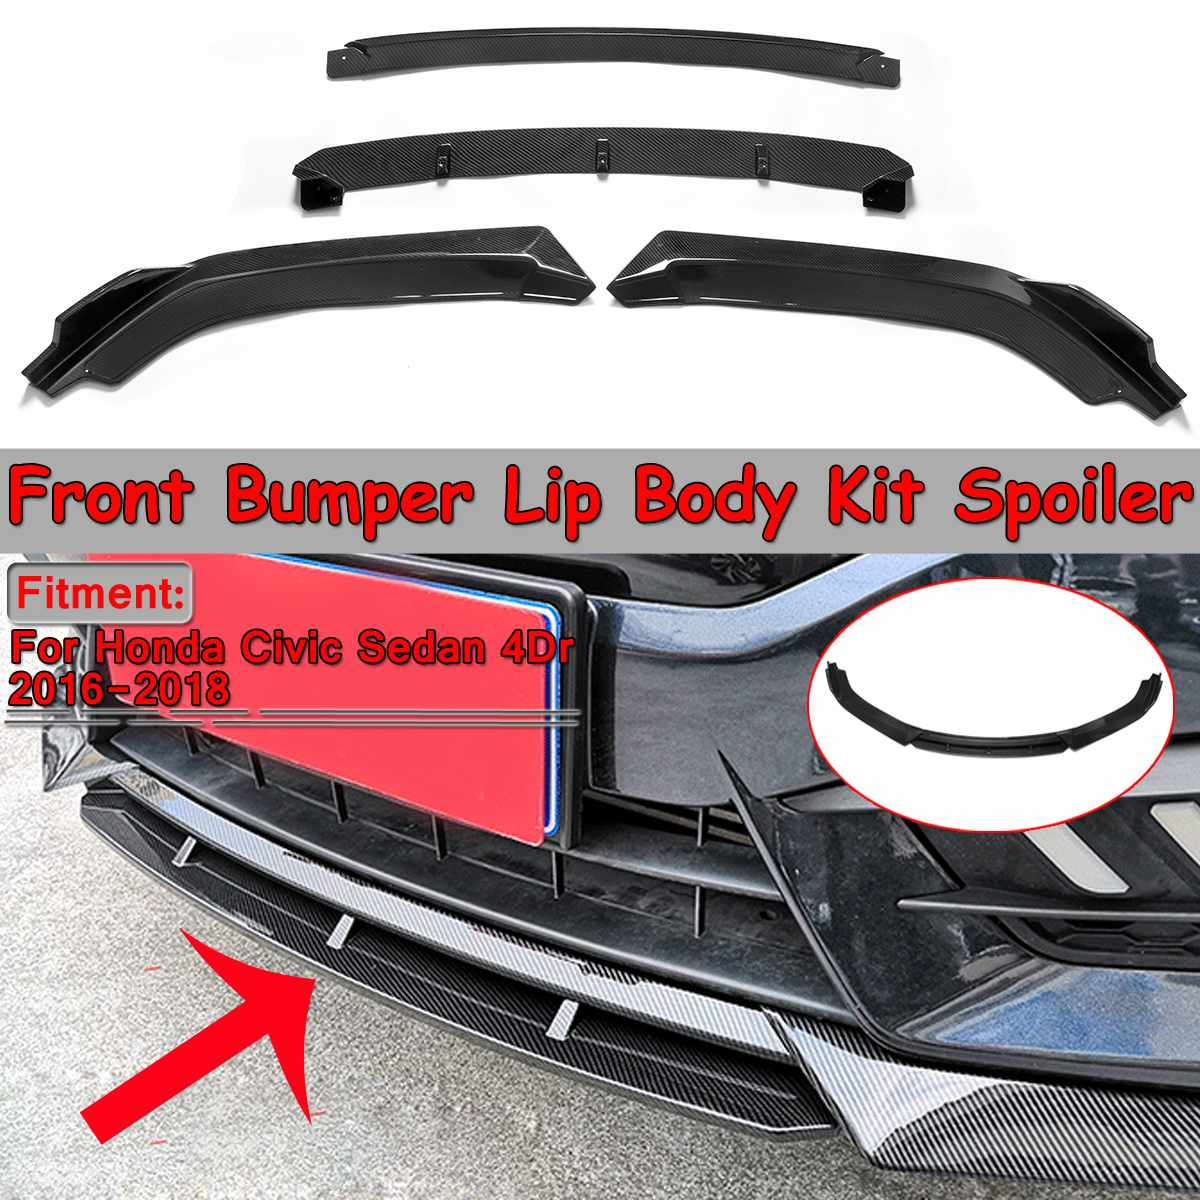 Nova 4pcs Difusor Lip Kit Corpo Frente Car Bumper Lip Splitter Spoiler Bumpers Protector Para Honda Civic Sedan 4Dr 2016-2018